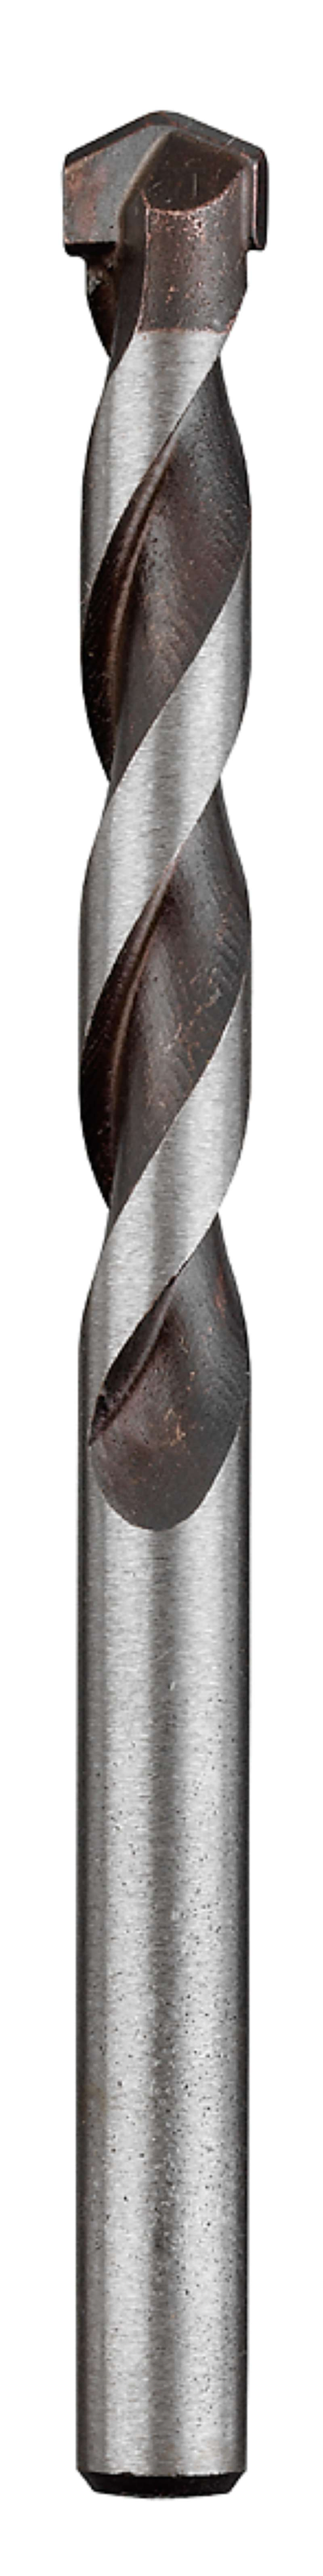 Сверло по камню Kwb 044-720 сверло по камню kwb 044 700